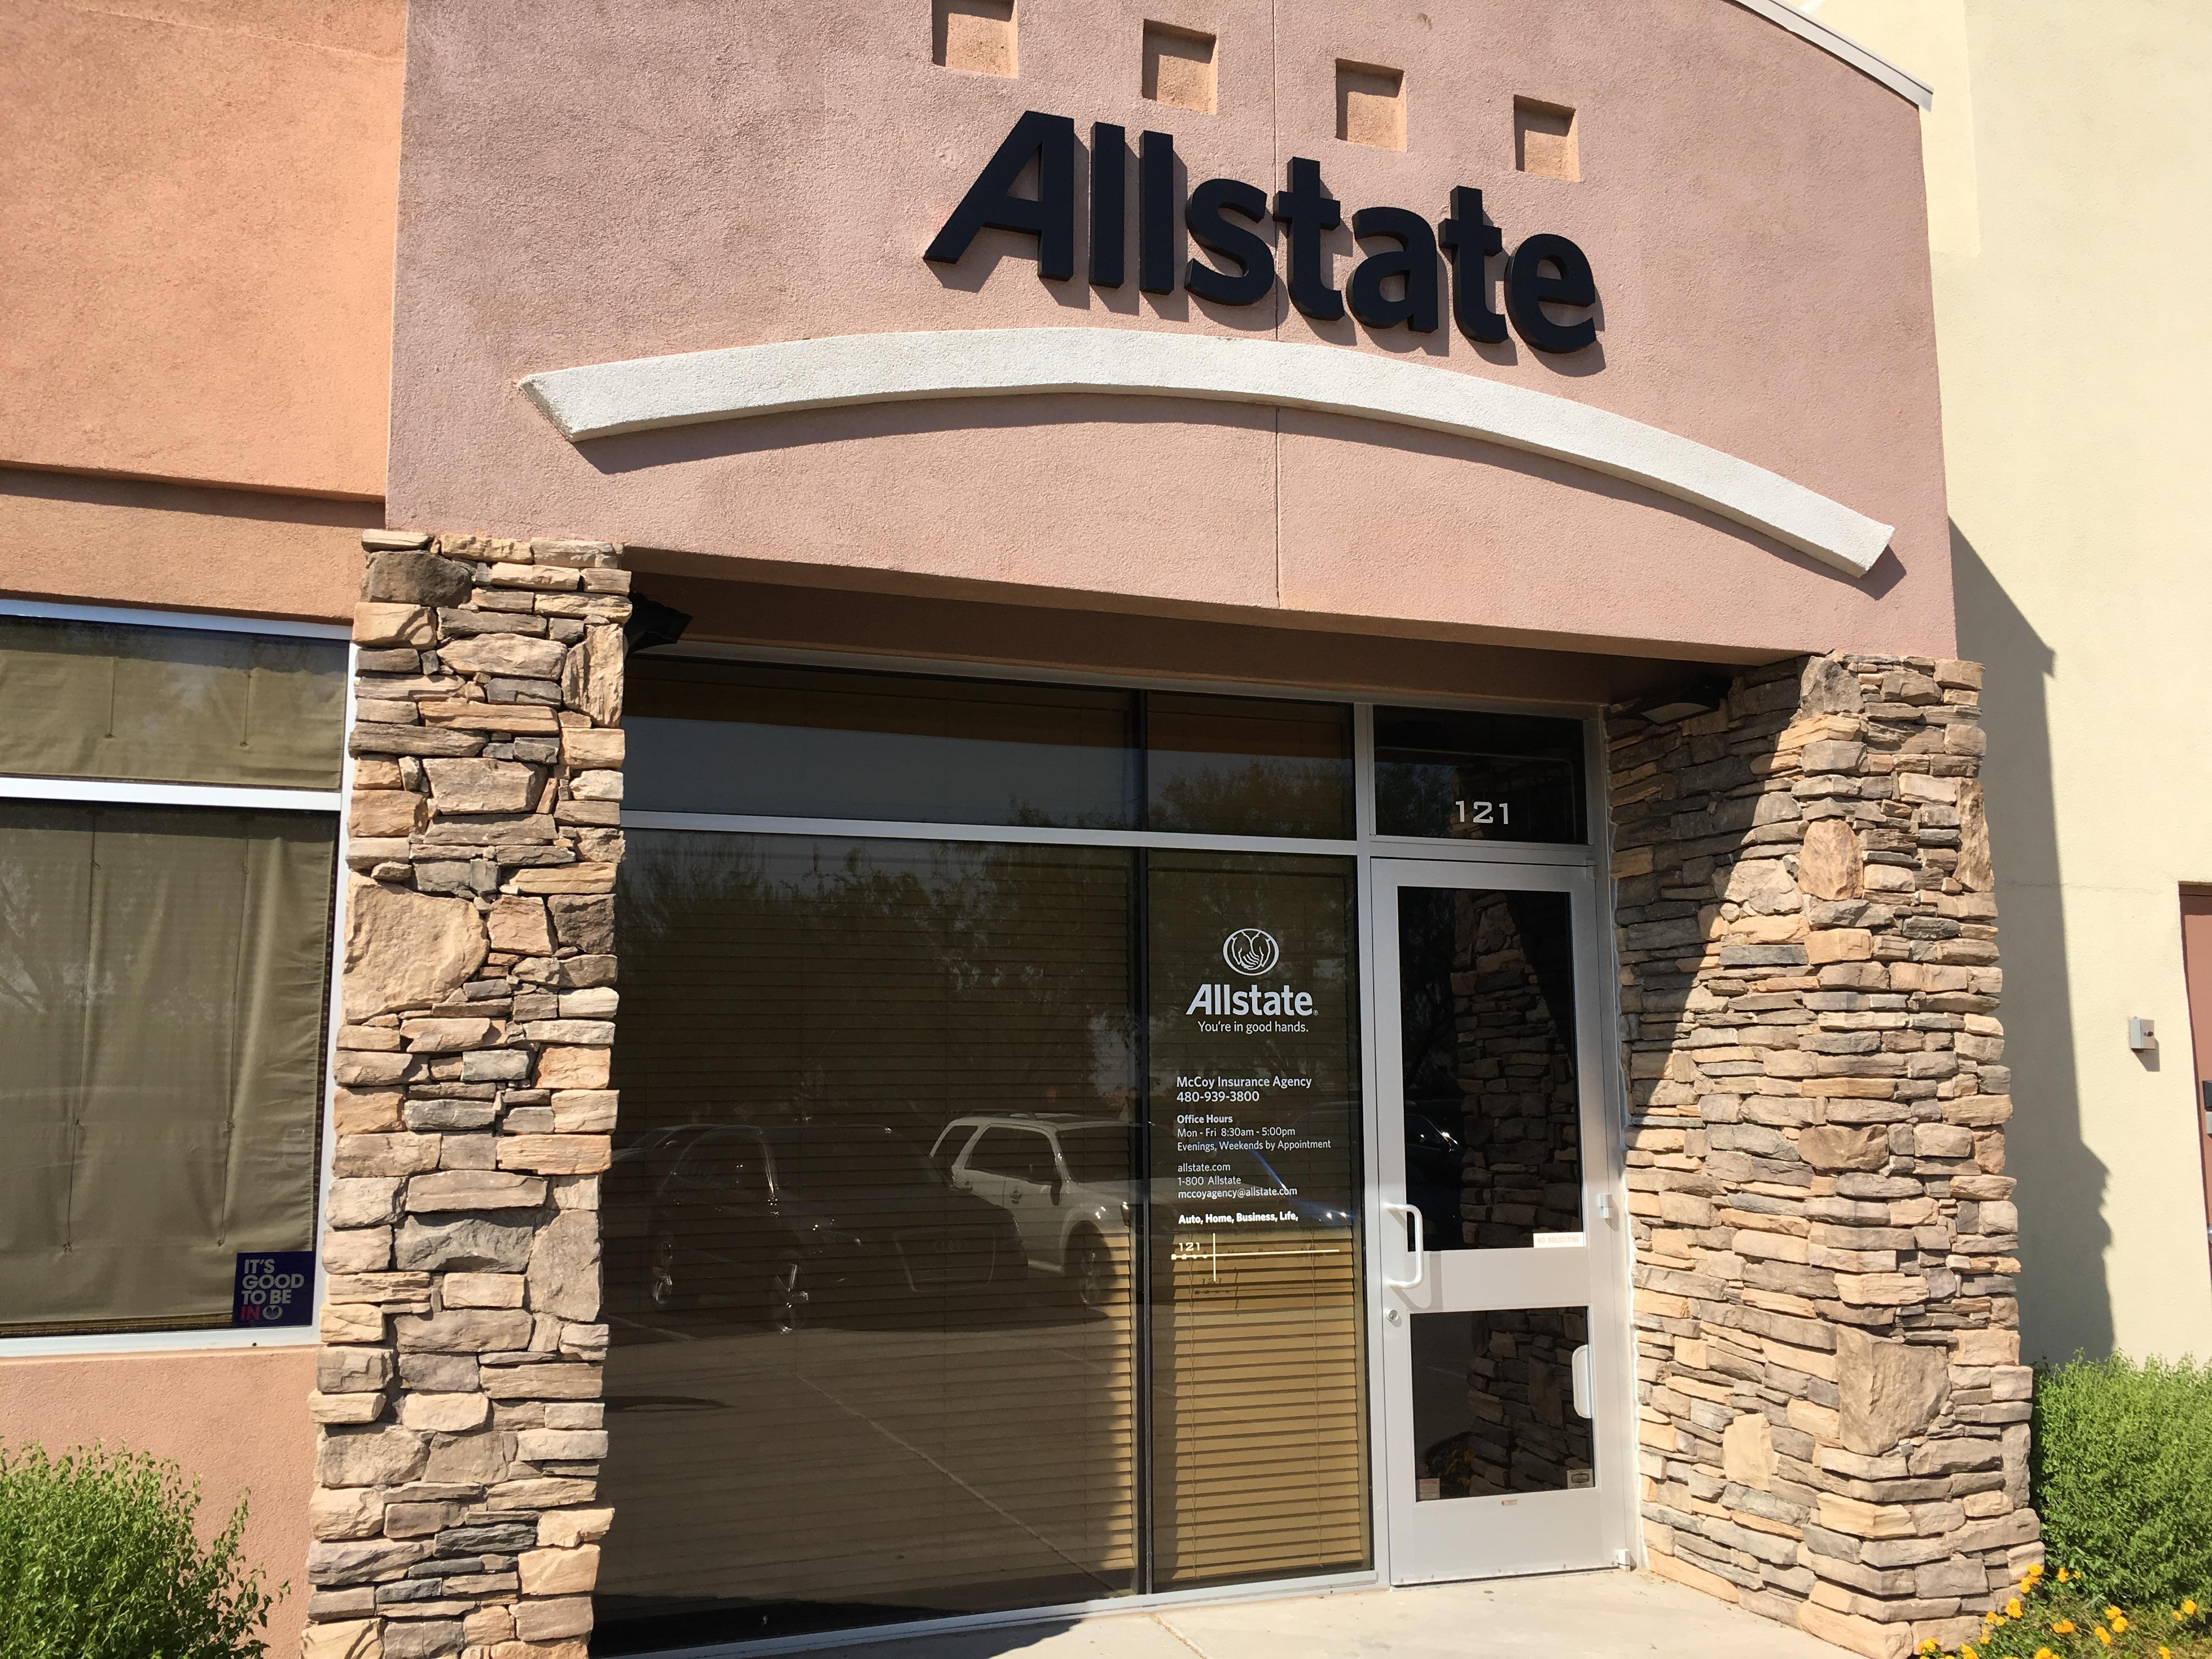 Allstate Insurance Agent: Derrick McCoy image 1